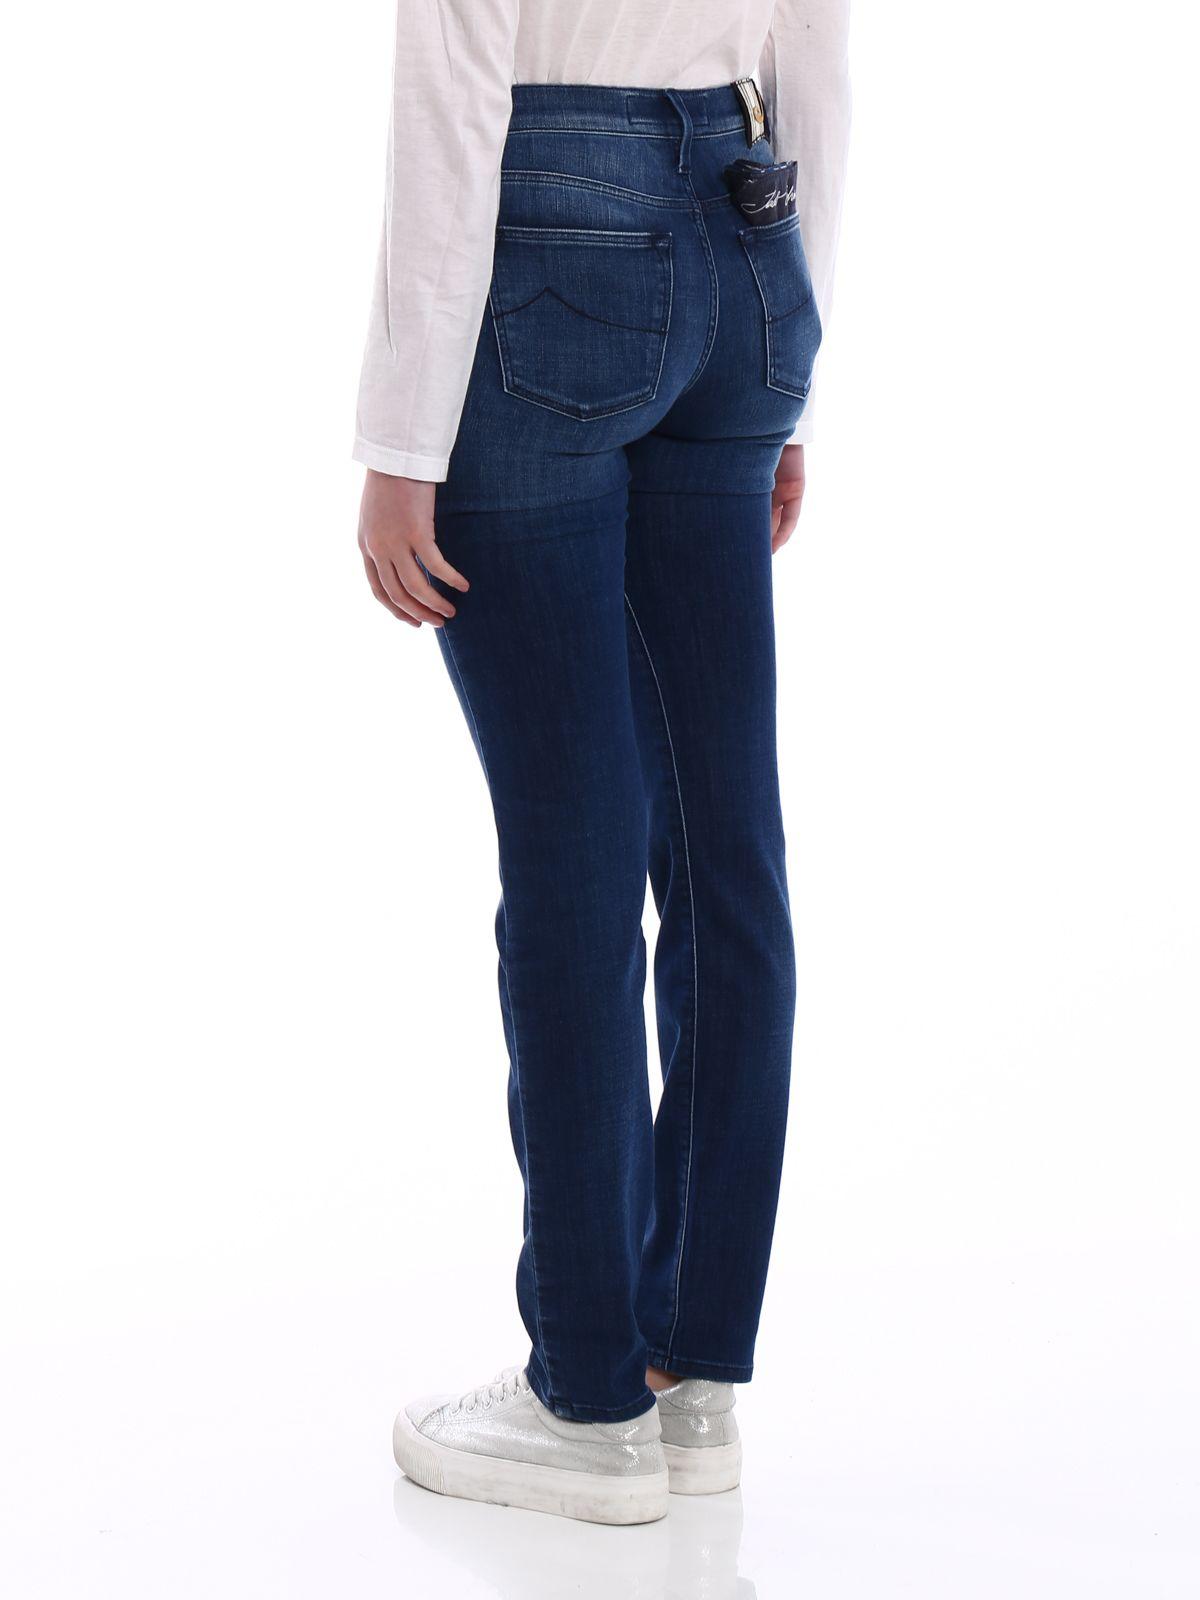 Jean Slim - Bleu Kimberly Jacob Cohen qI8k73dX3